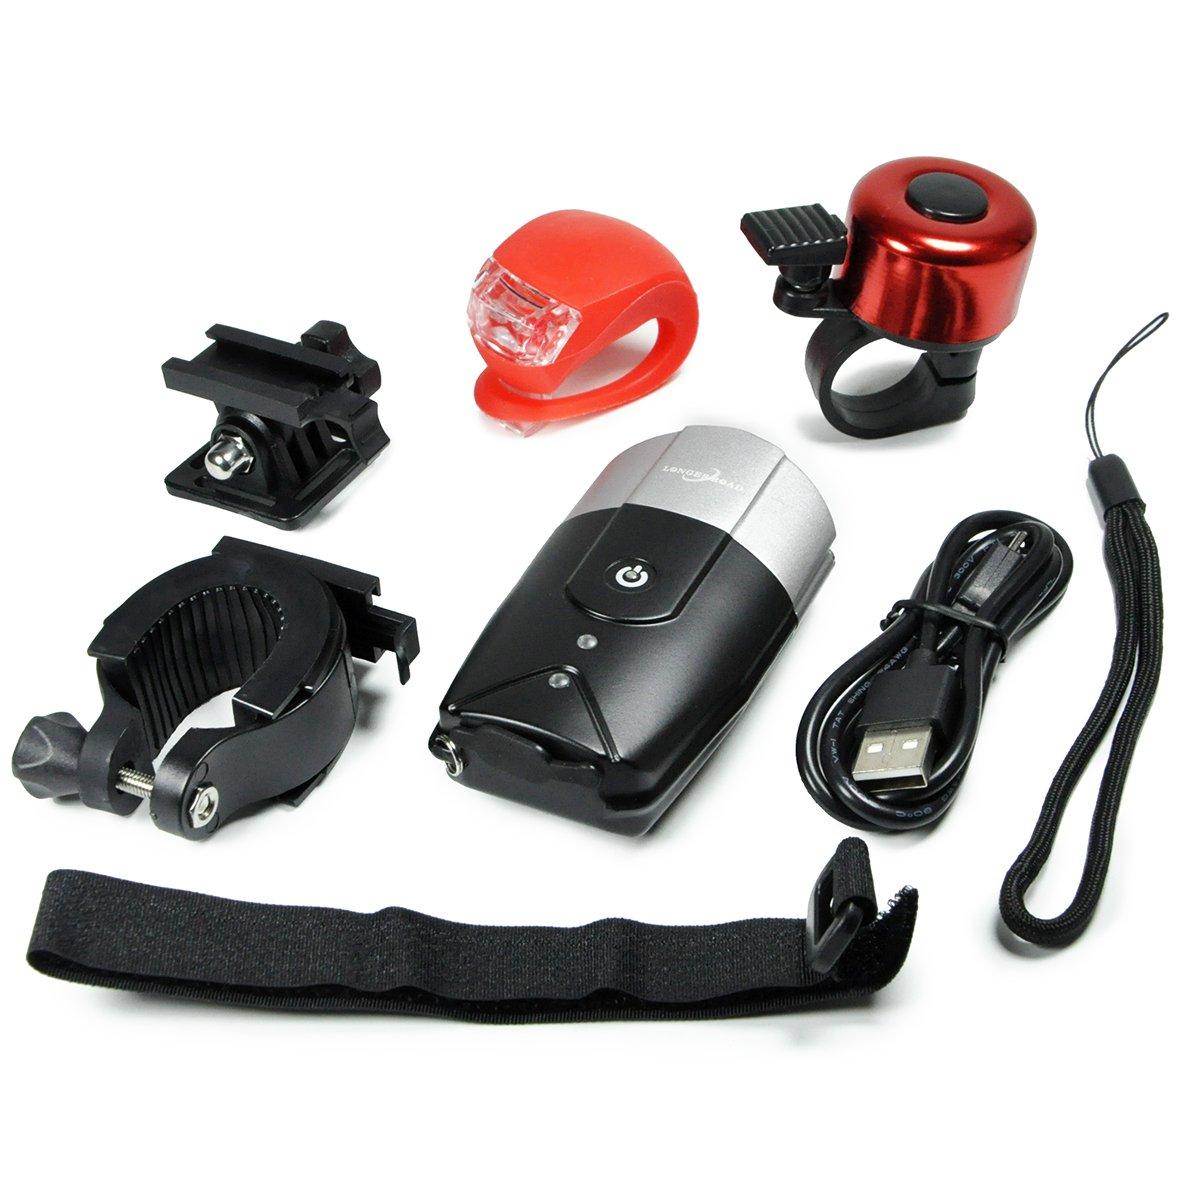 Longer Road USB Rechargeable Bike Light Waterproof Bicycle Headlight